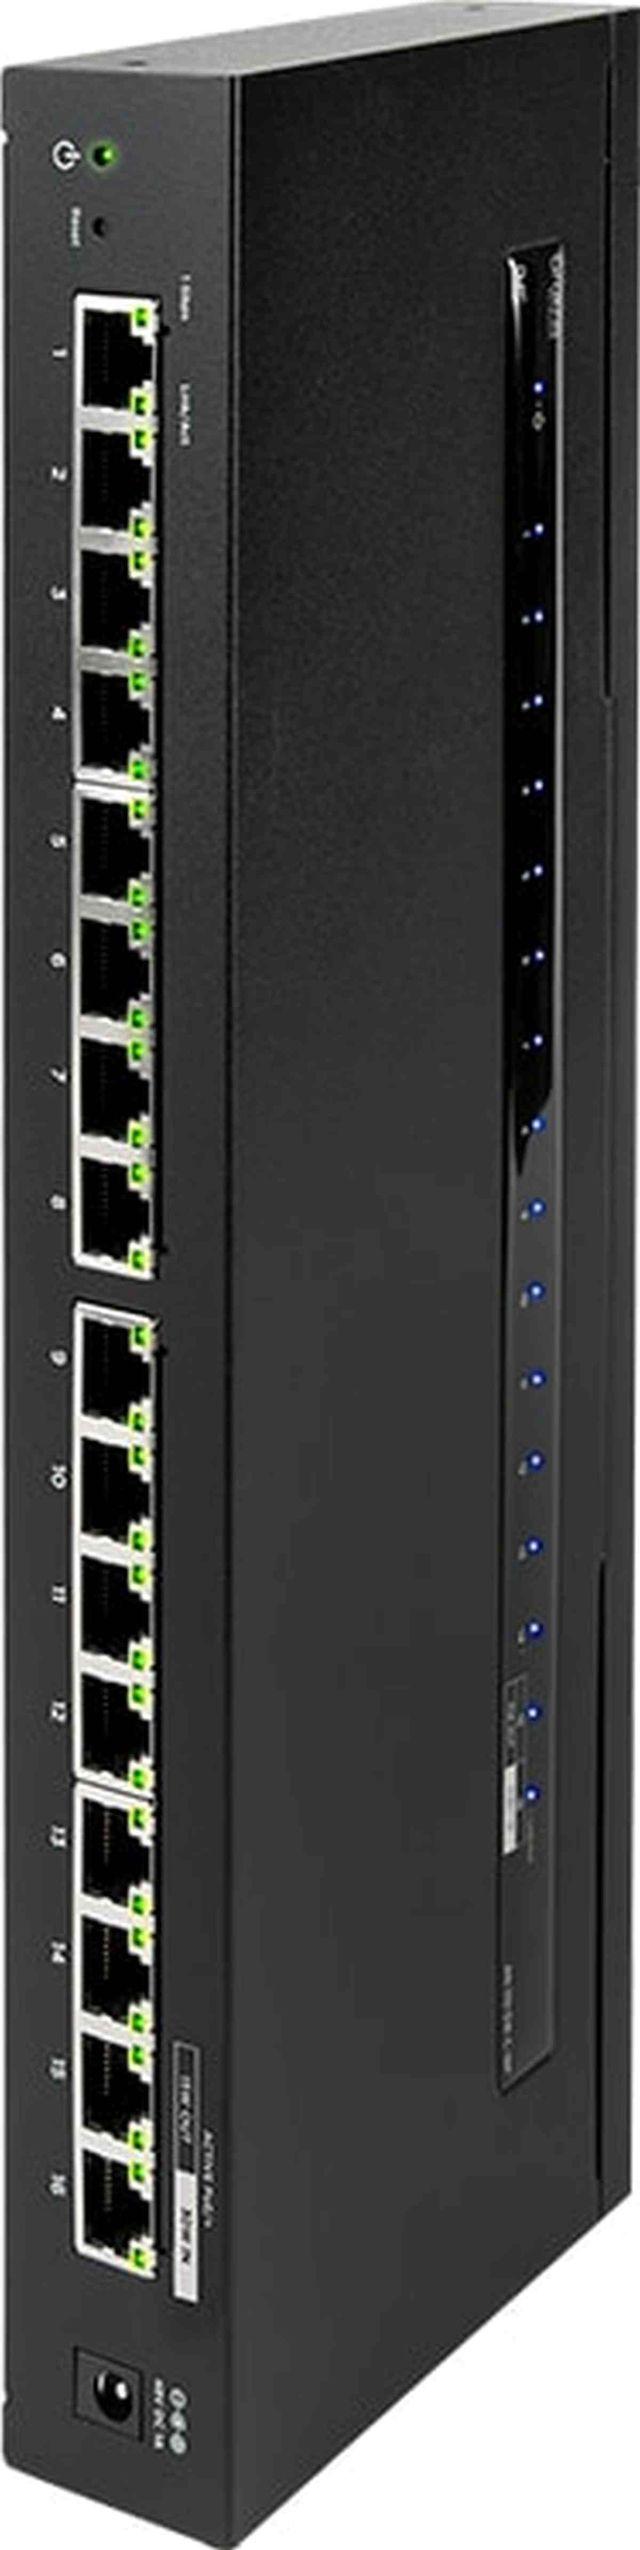 SnapAV Araknis Networks® 110 Series Black 16 Side Port Unmanaged+ Gigabit Compact Switch-AN-110-SW-C-16P